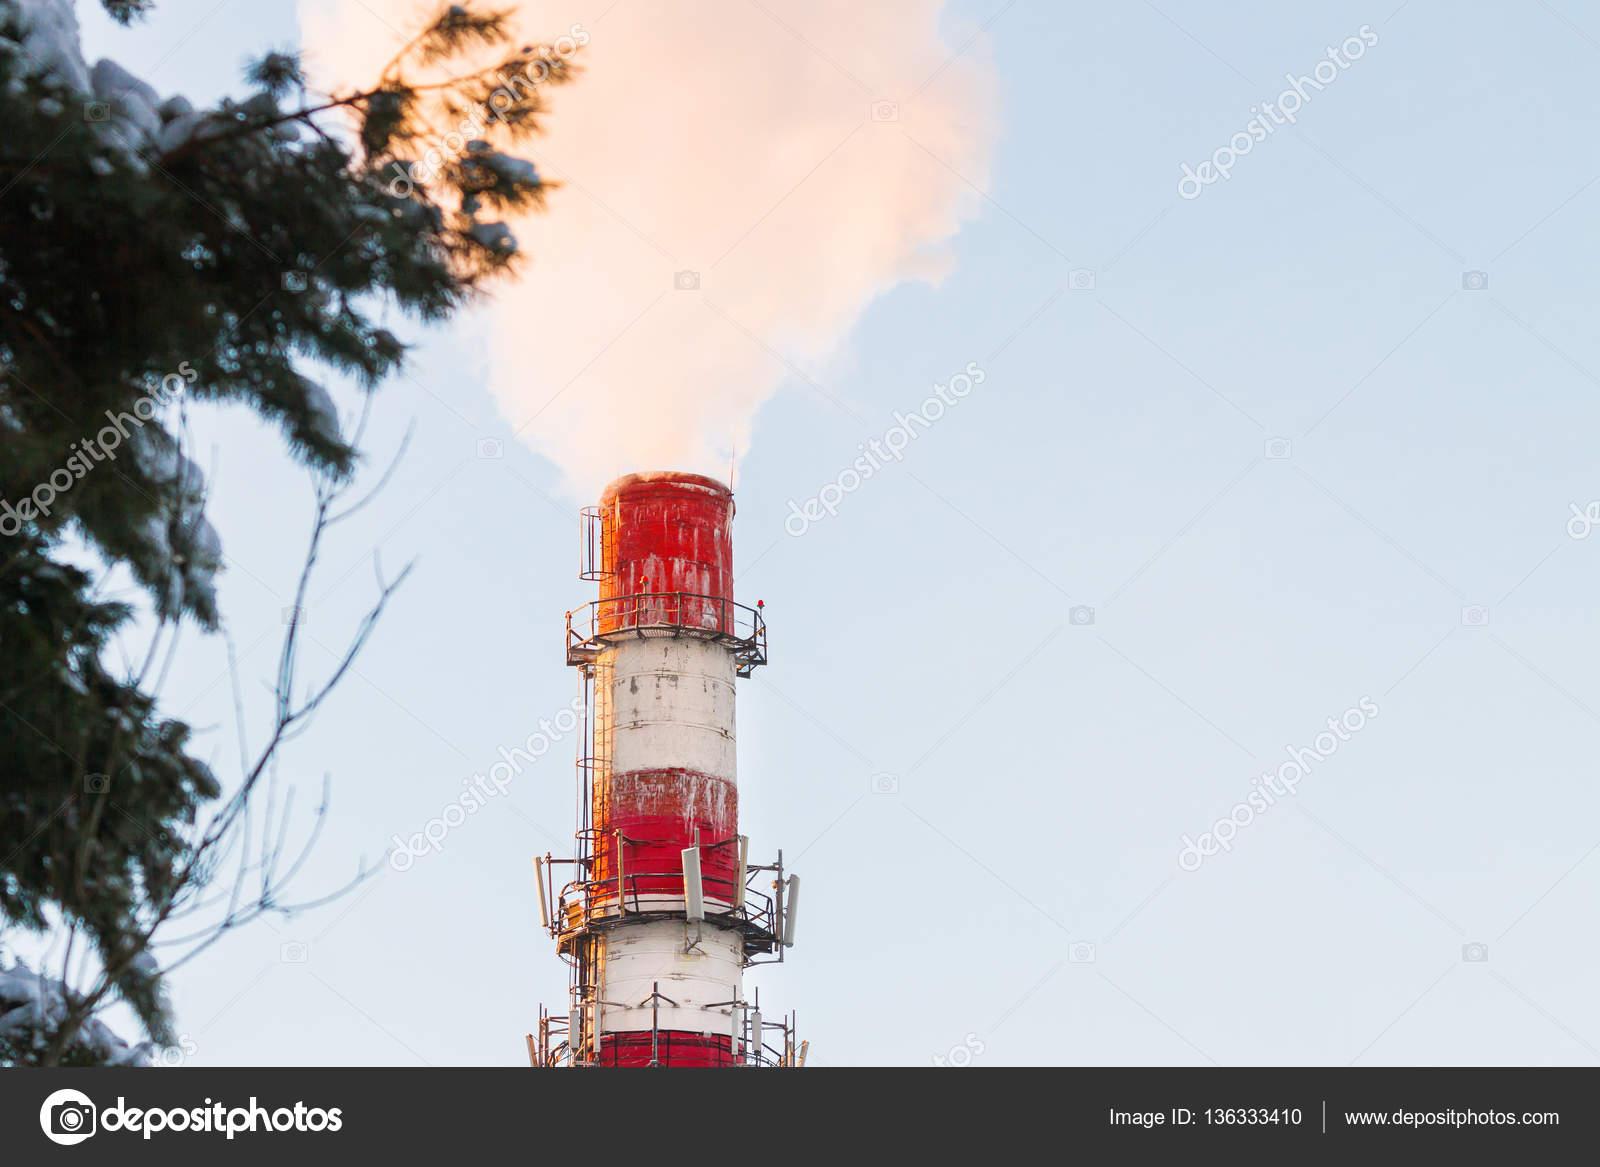 Roten Kessel Haus Schornstein. Dampfbad gegen den klaren blauen ...